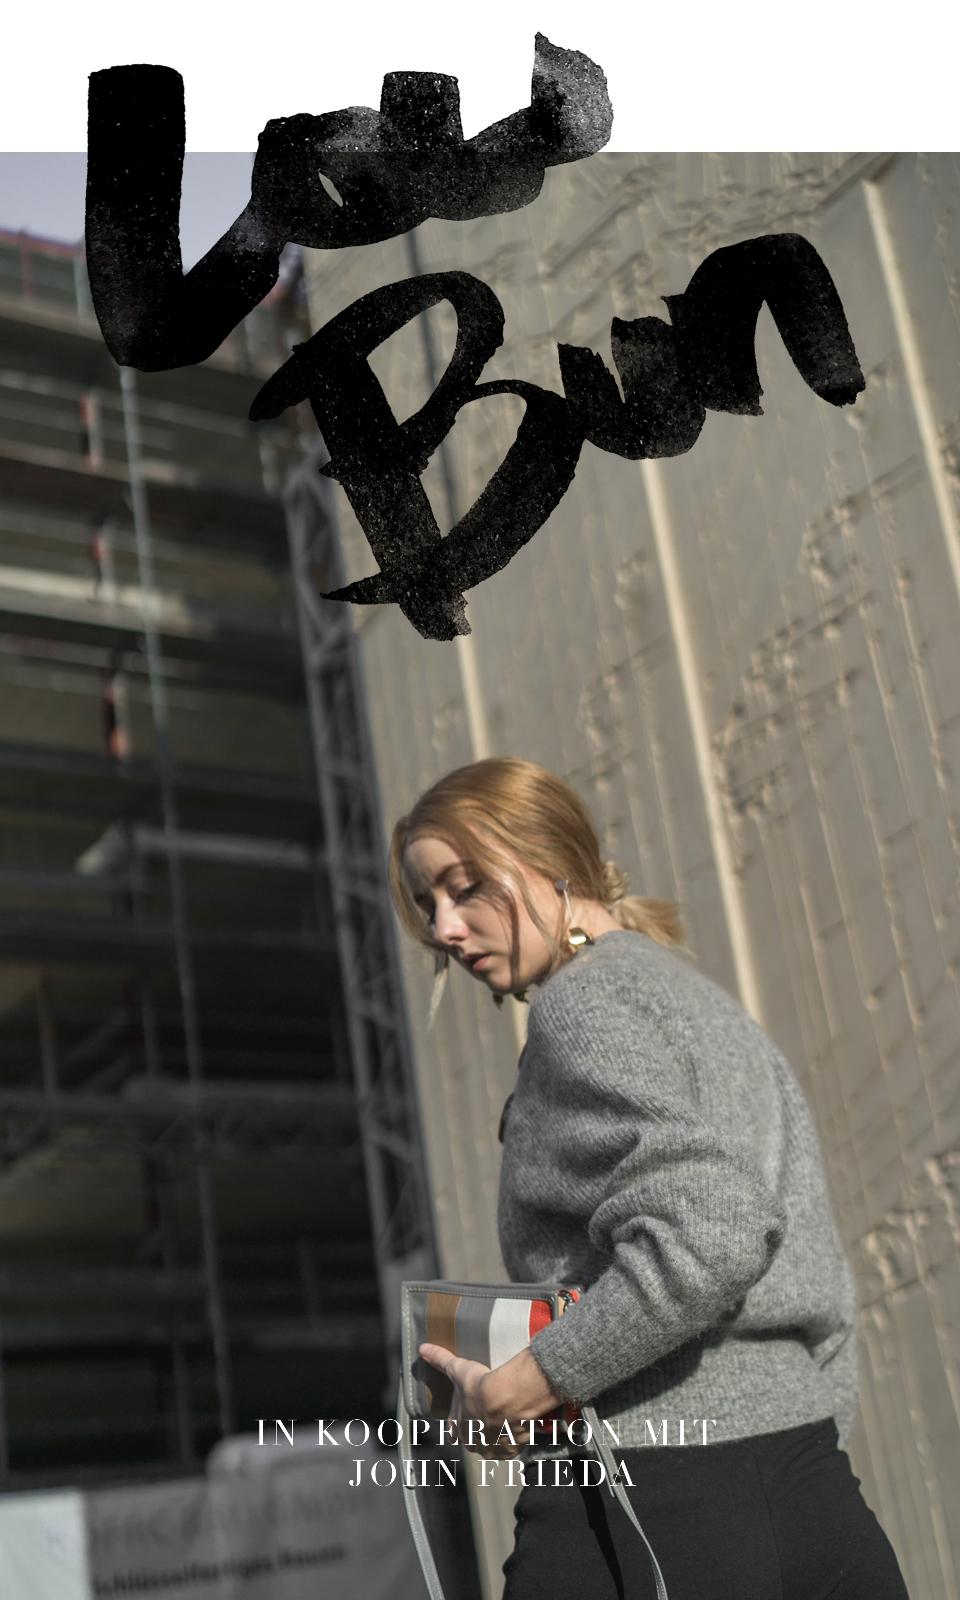 blog_instagram_Blogger_Fashion_deutschland_beauty_style_bloggerin_travel_berlin_thelimitsofcontrol_John Frieda